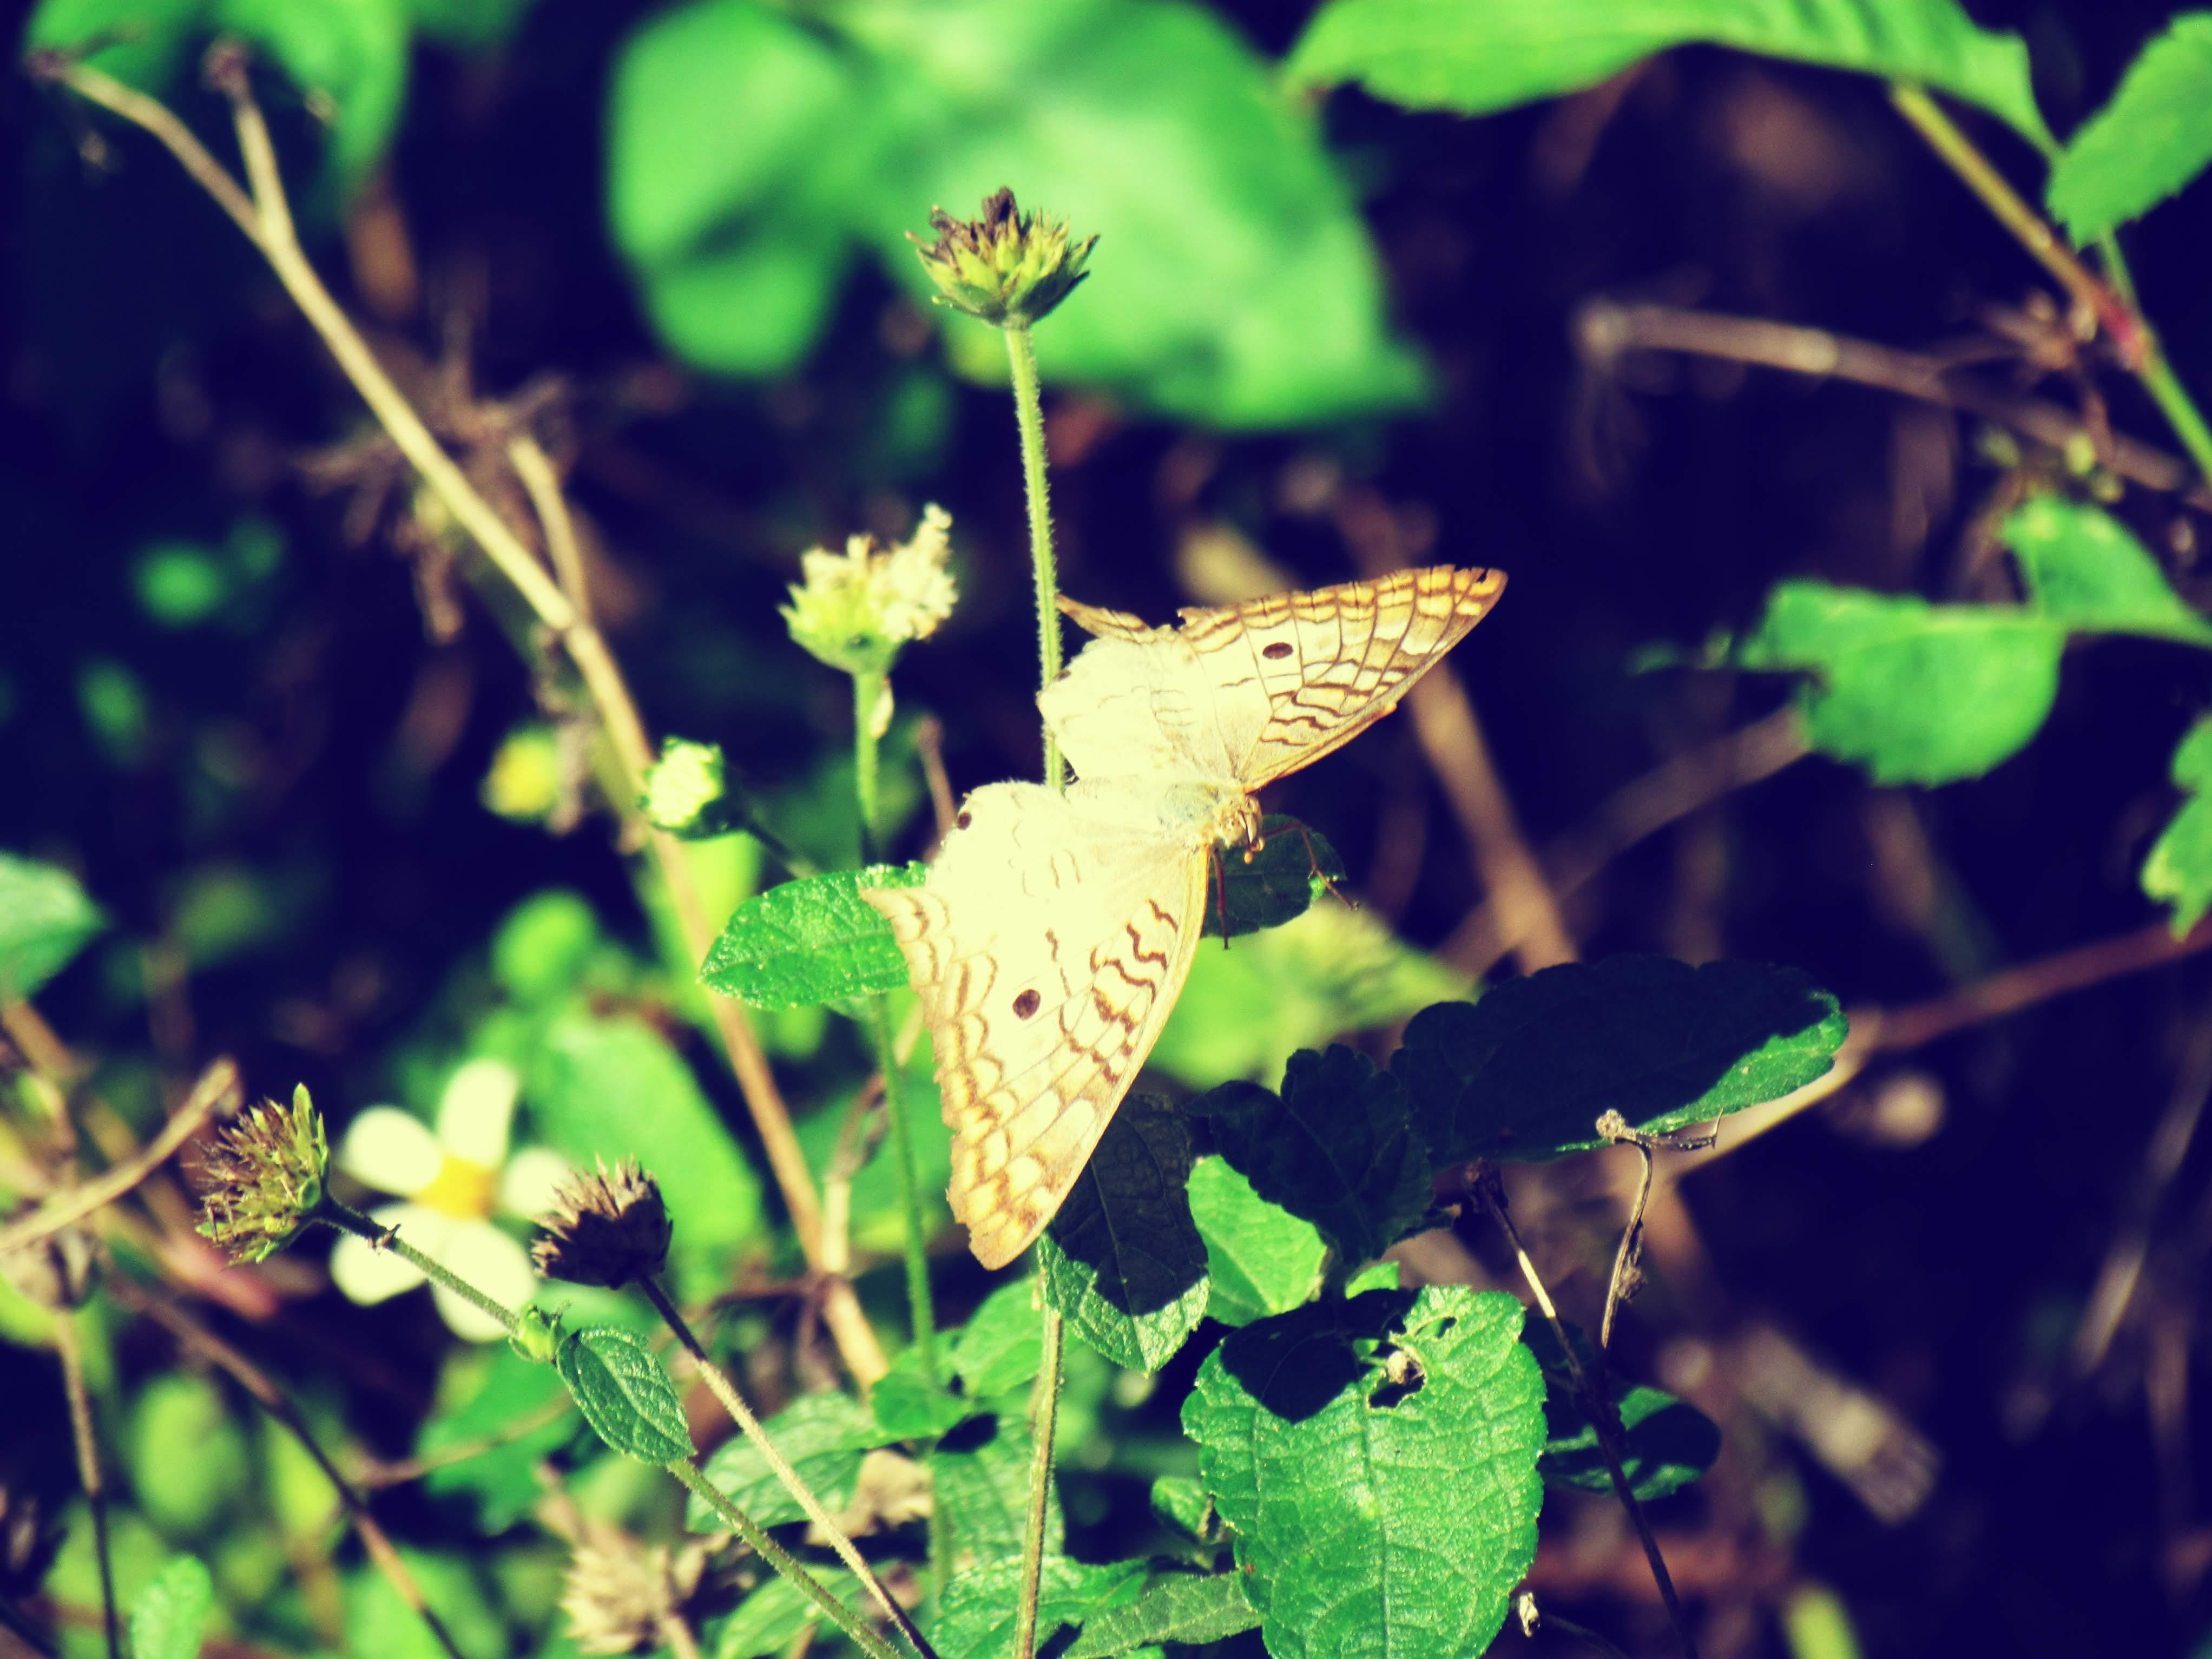 A pale, tan butterfly in the butterfly garden of Hammock Park in Florida